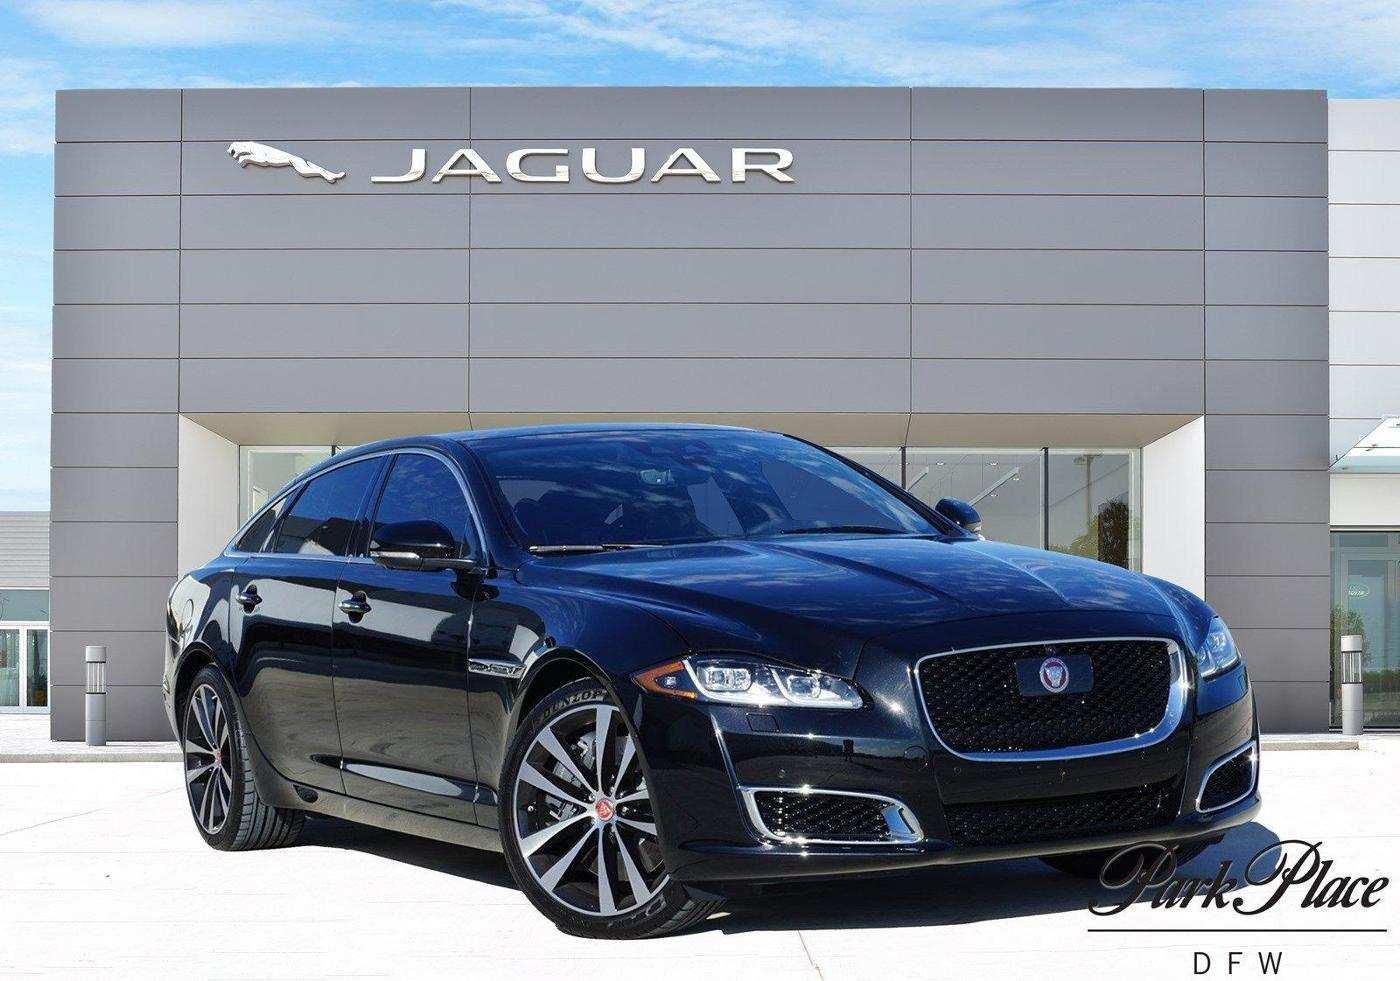 49 New Xj Jaguar 2019 Prices by Xj Jaguar 2019